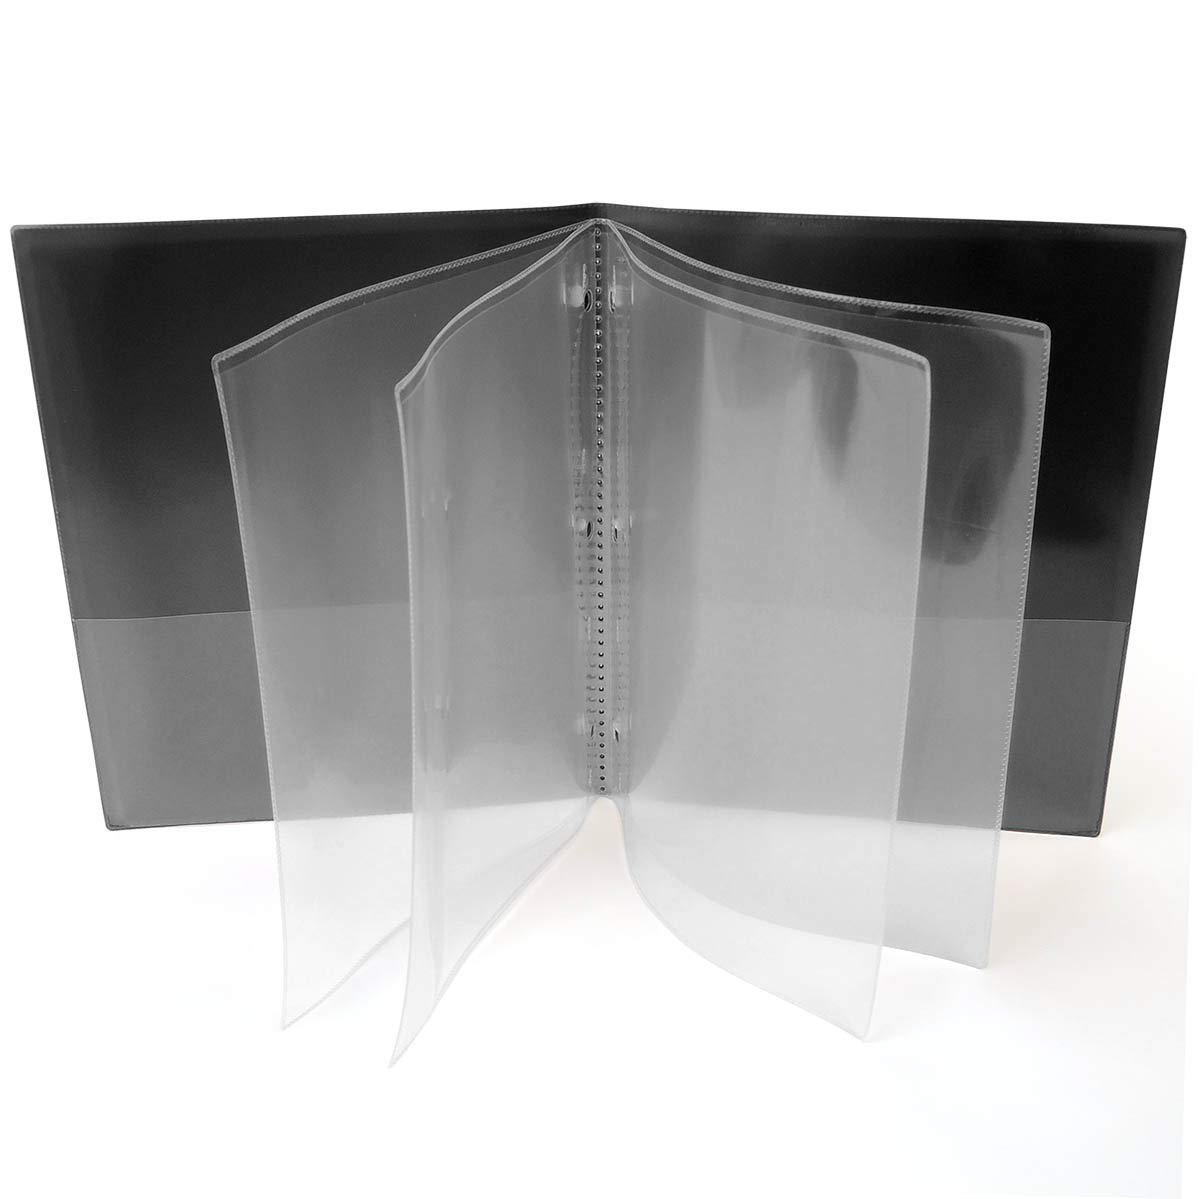 StoreSMART - Plastic Multi-Pocket Folders - Black - Four-Page - 25 Pack - ZR8006-BK-25 by STORE SMART